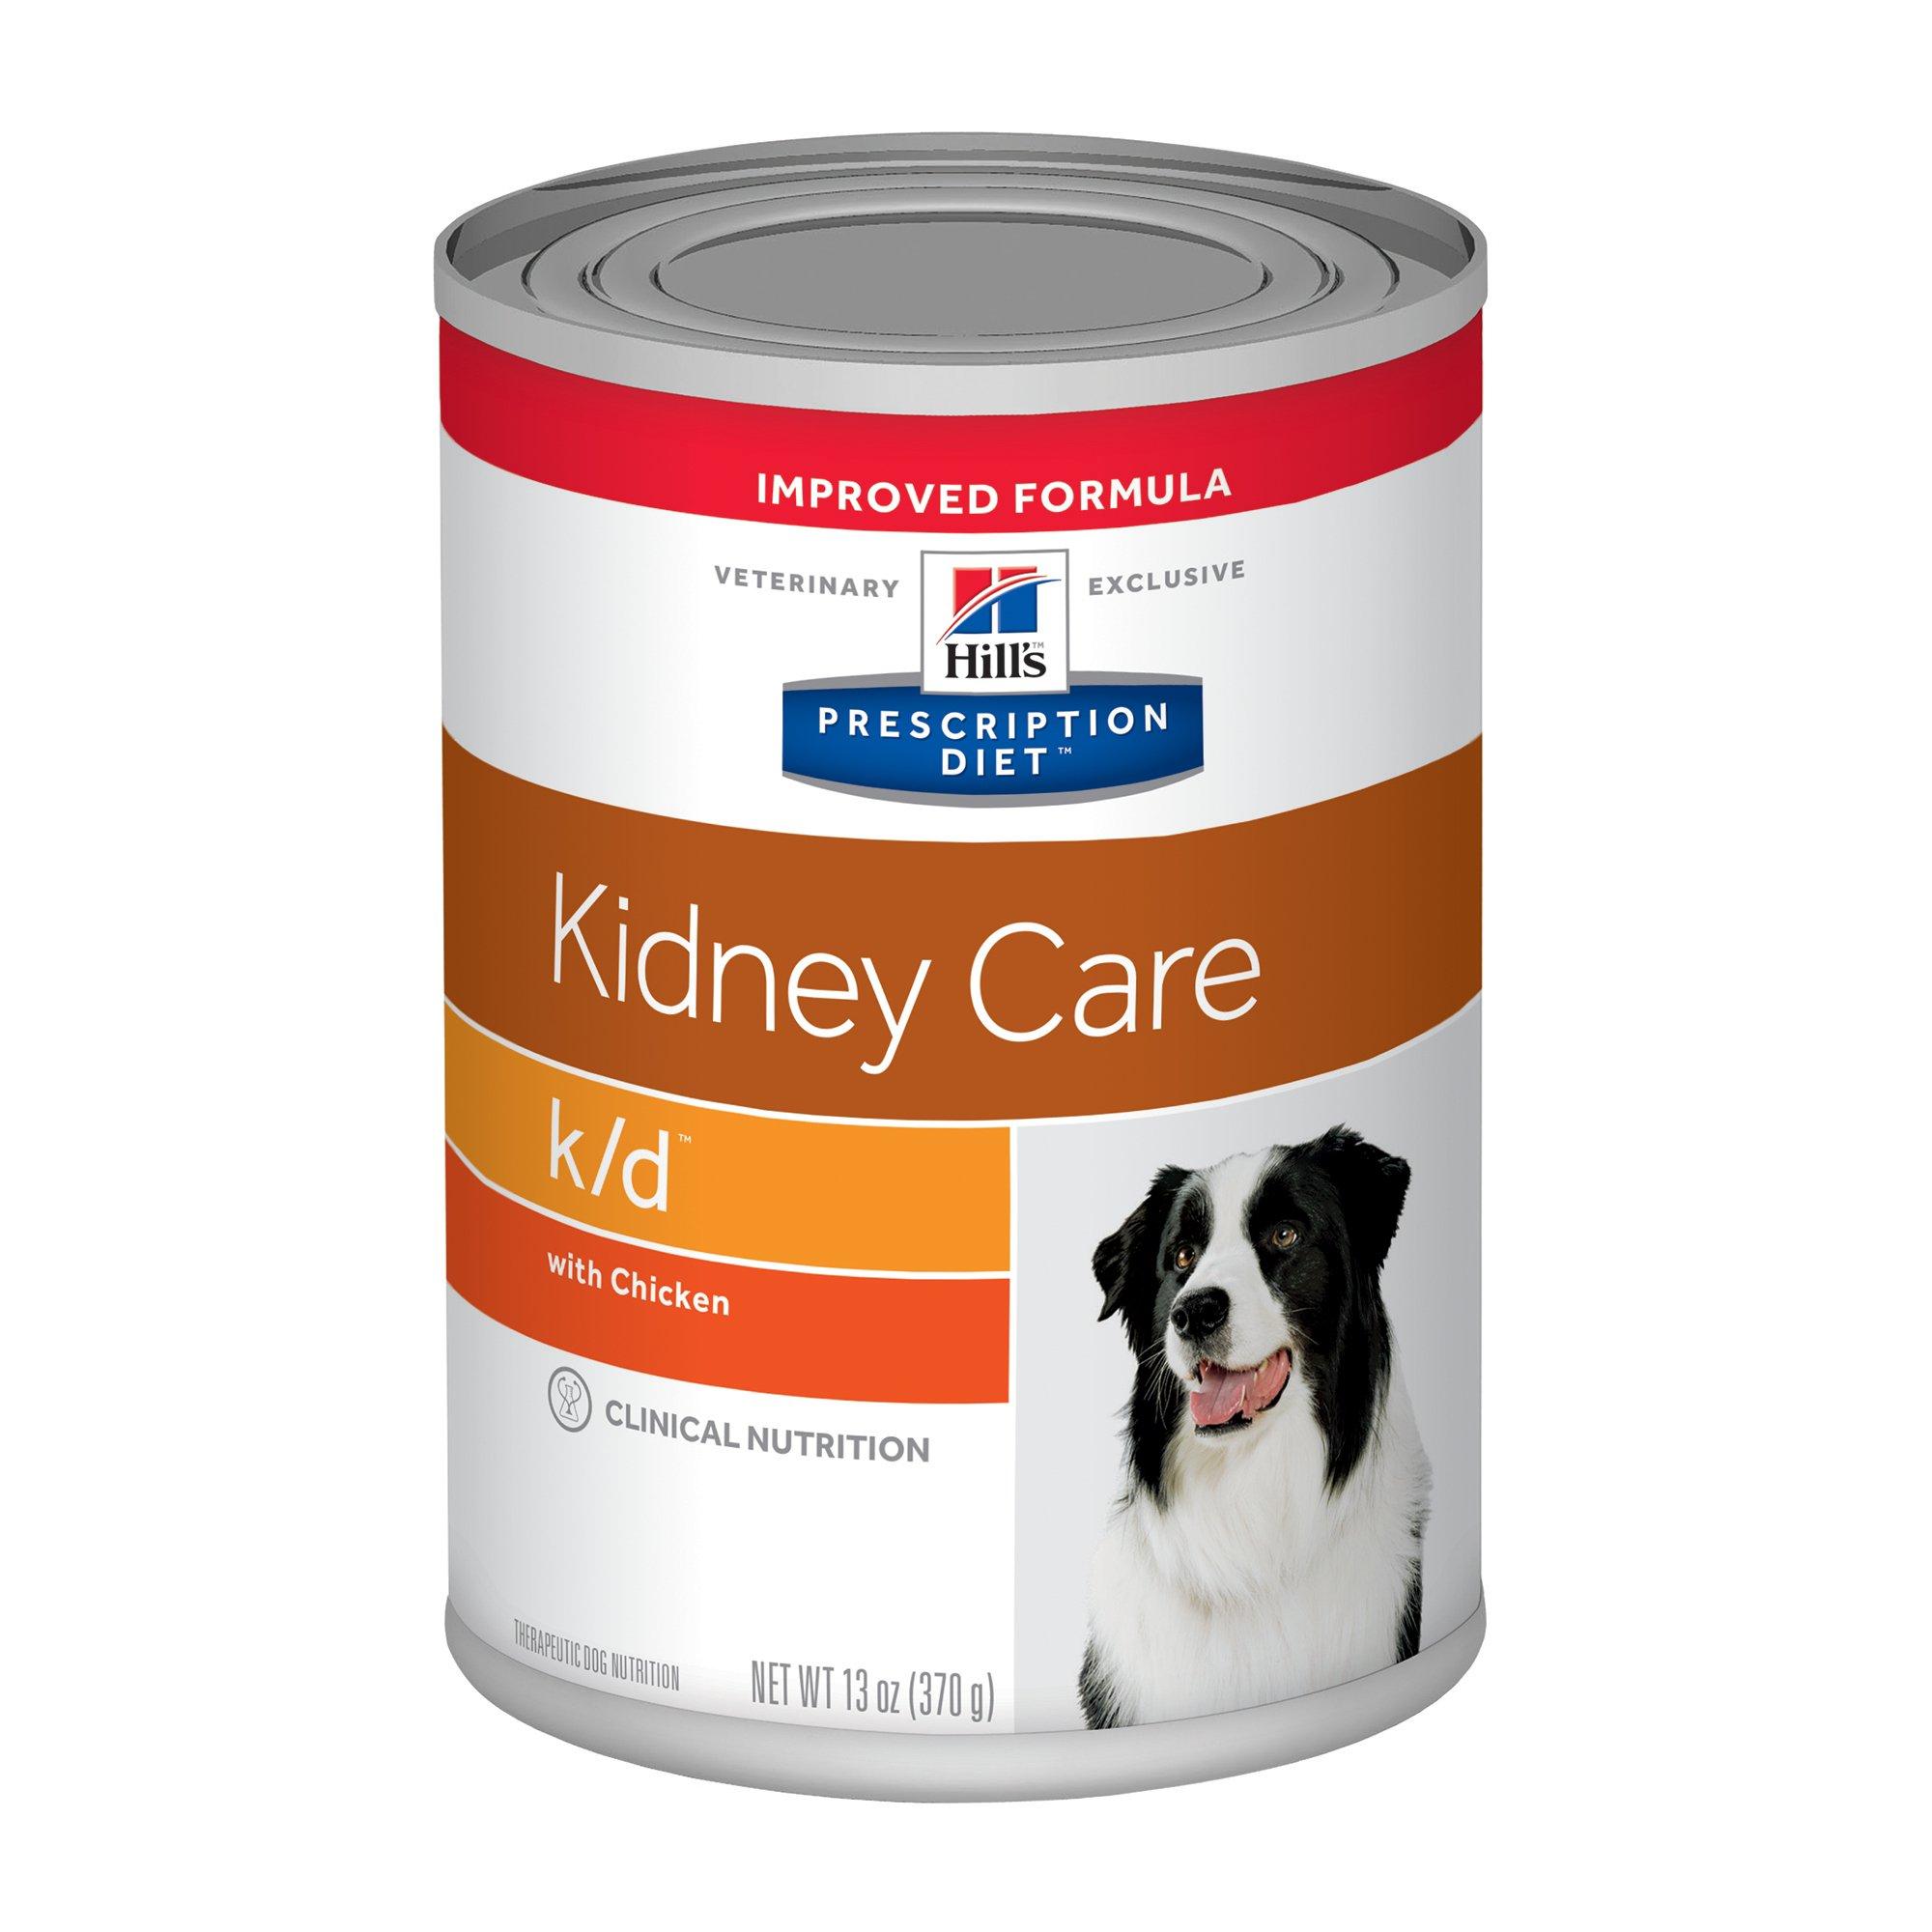 Hill's Prescription Diet K/d Kidney Care With Chicken